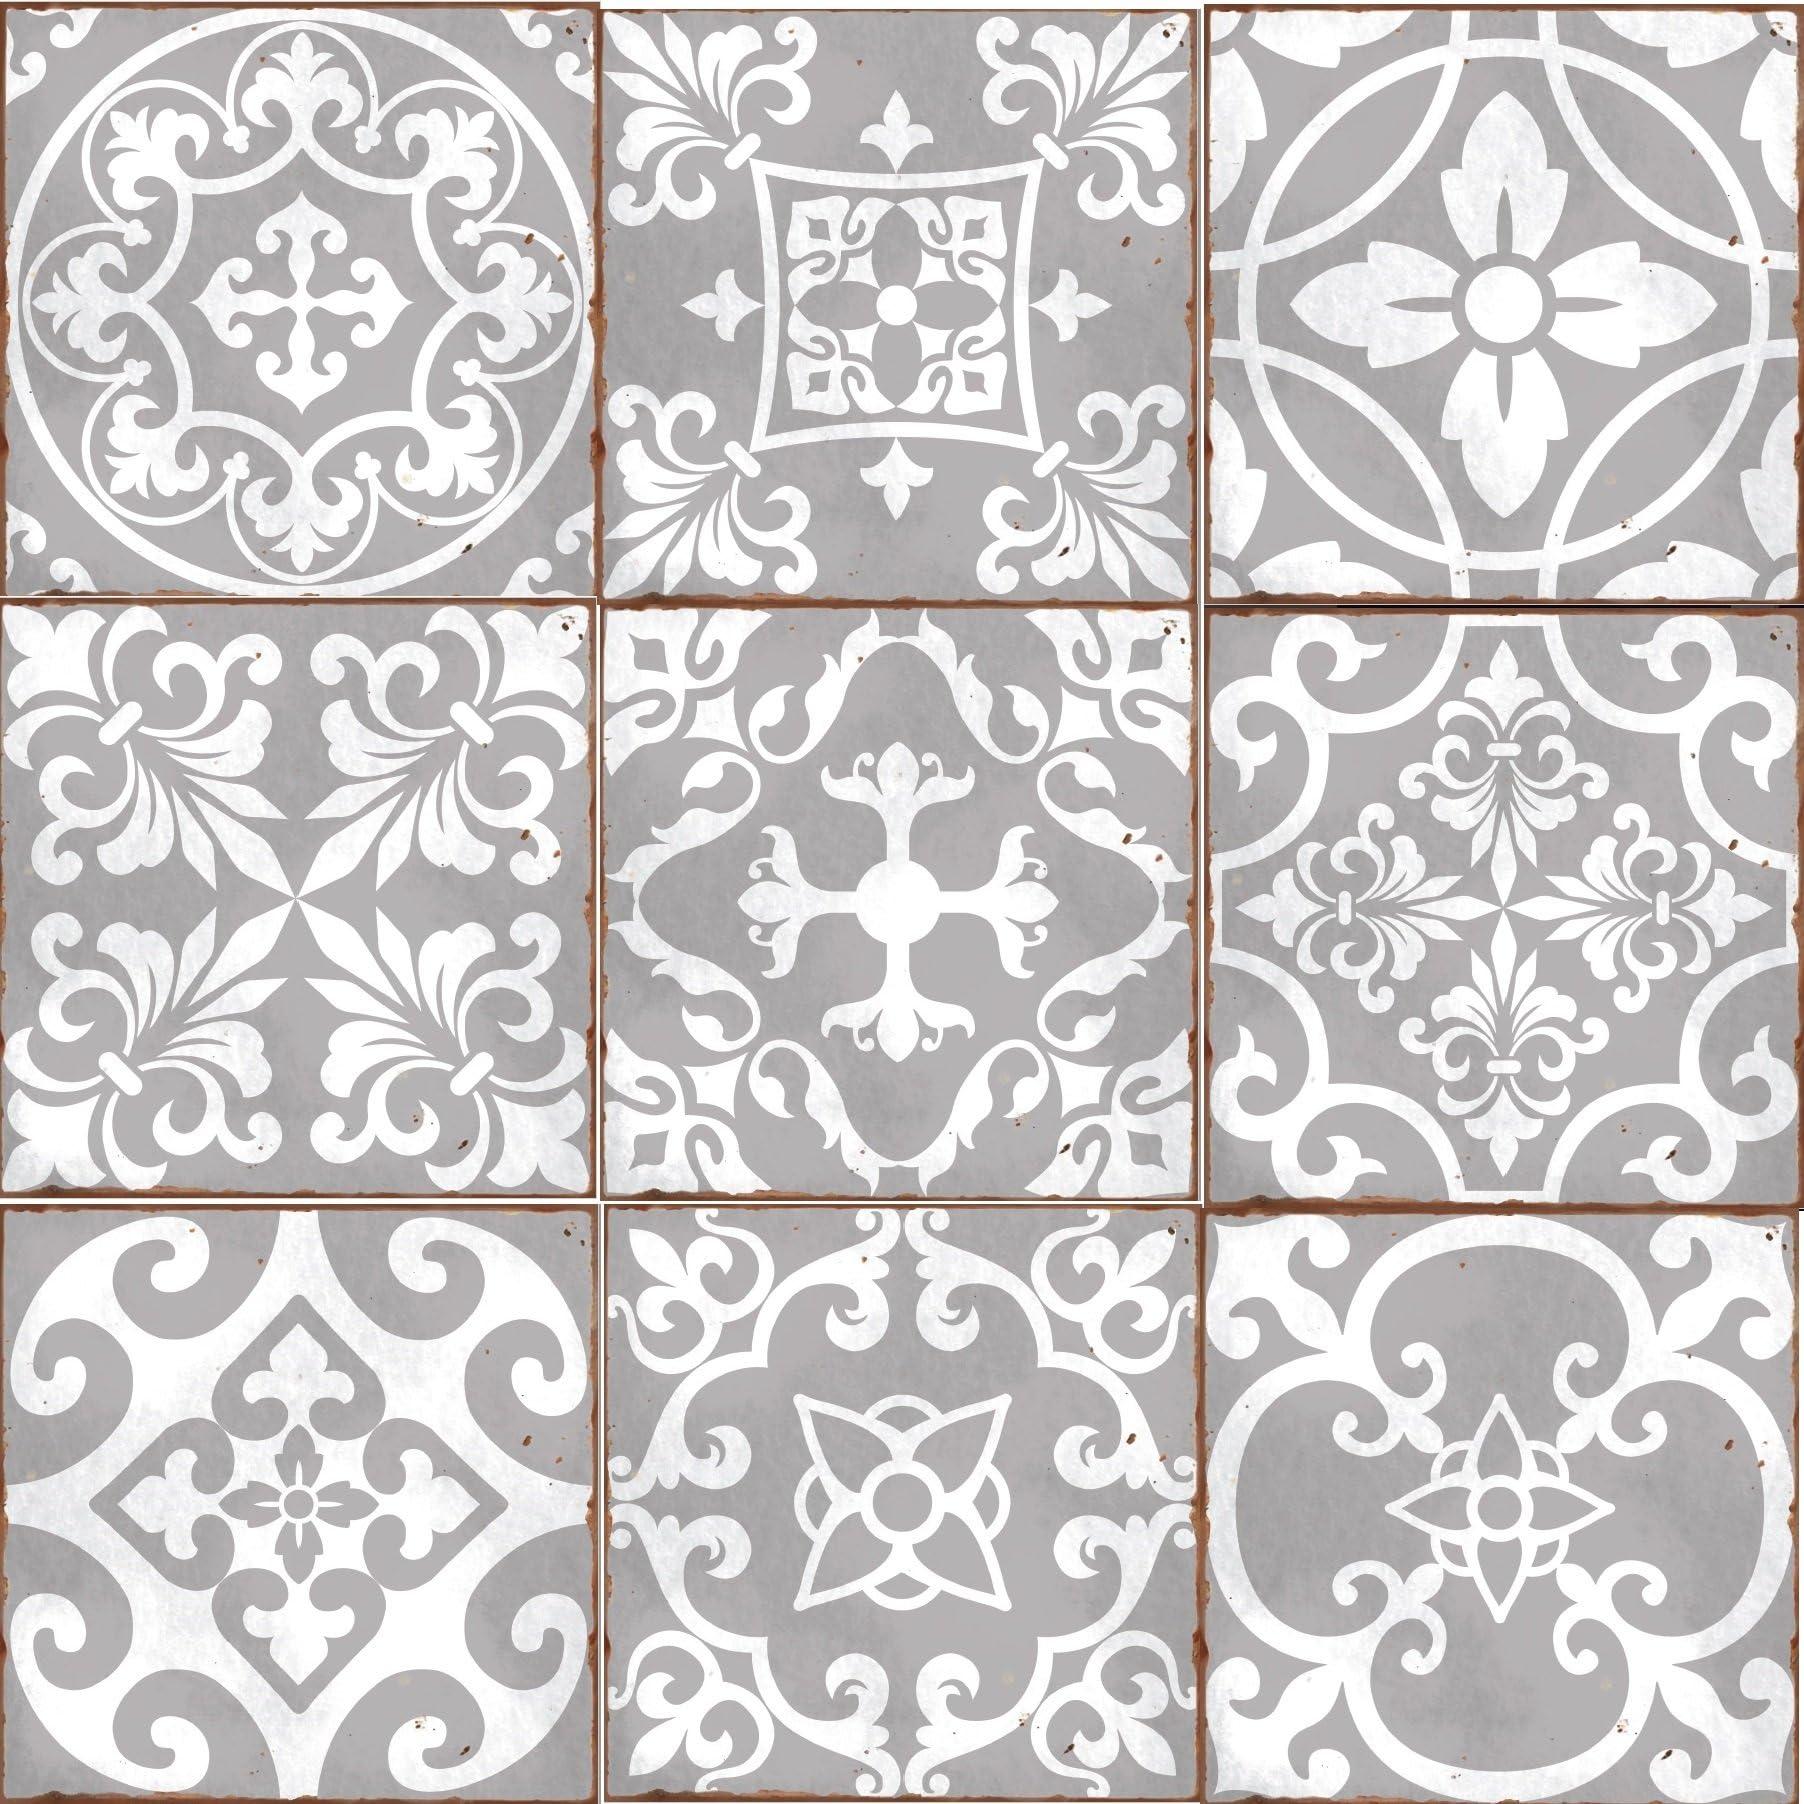 tile stickers home kitchen amazon co uk rh amazon co uk Decorative Tile Backsplash Decorative Kitchen Floor Tile